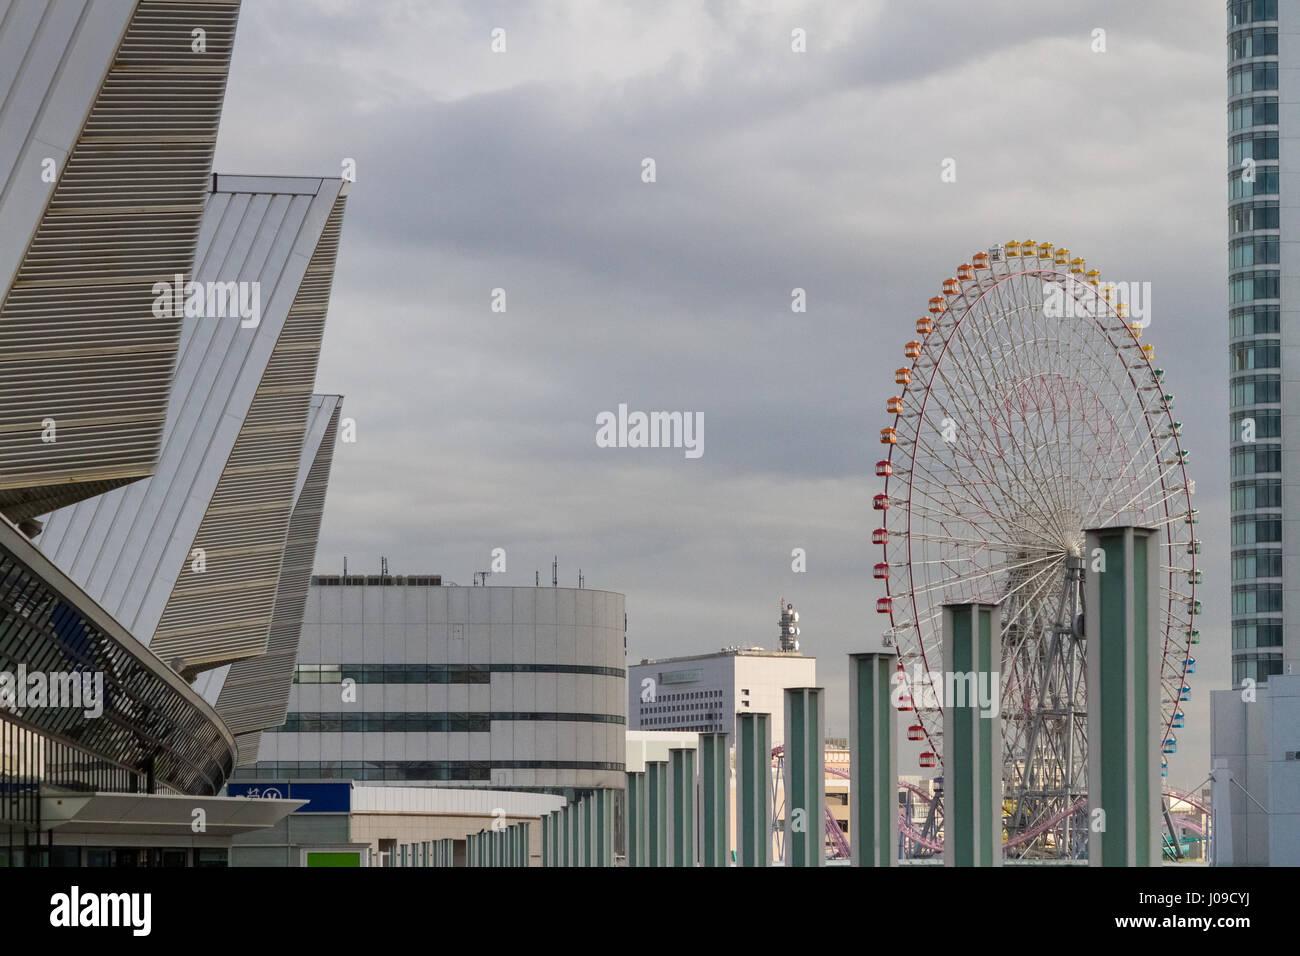 Cosmos Clock Ferris wheel in Yokohama, Kanagawa, Japan Friday February 24th 2017 - Stock Image